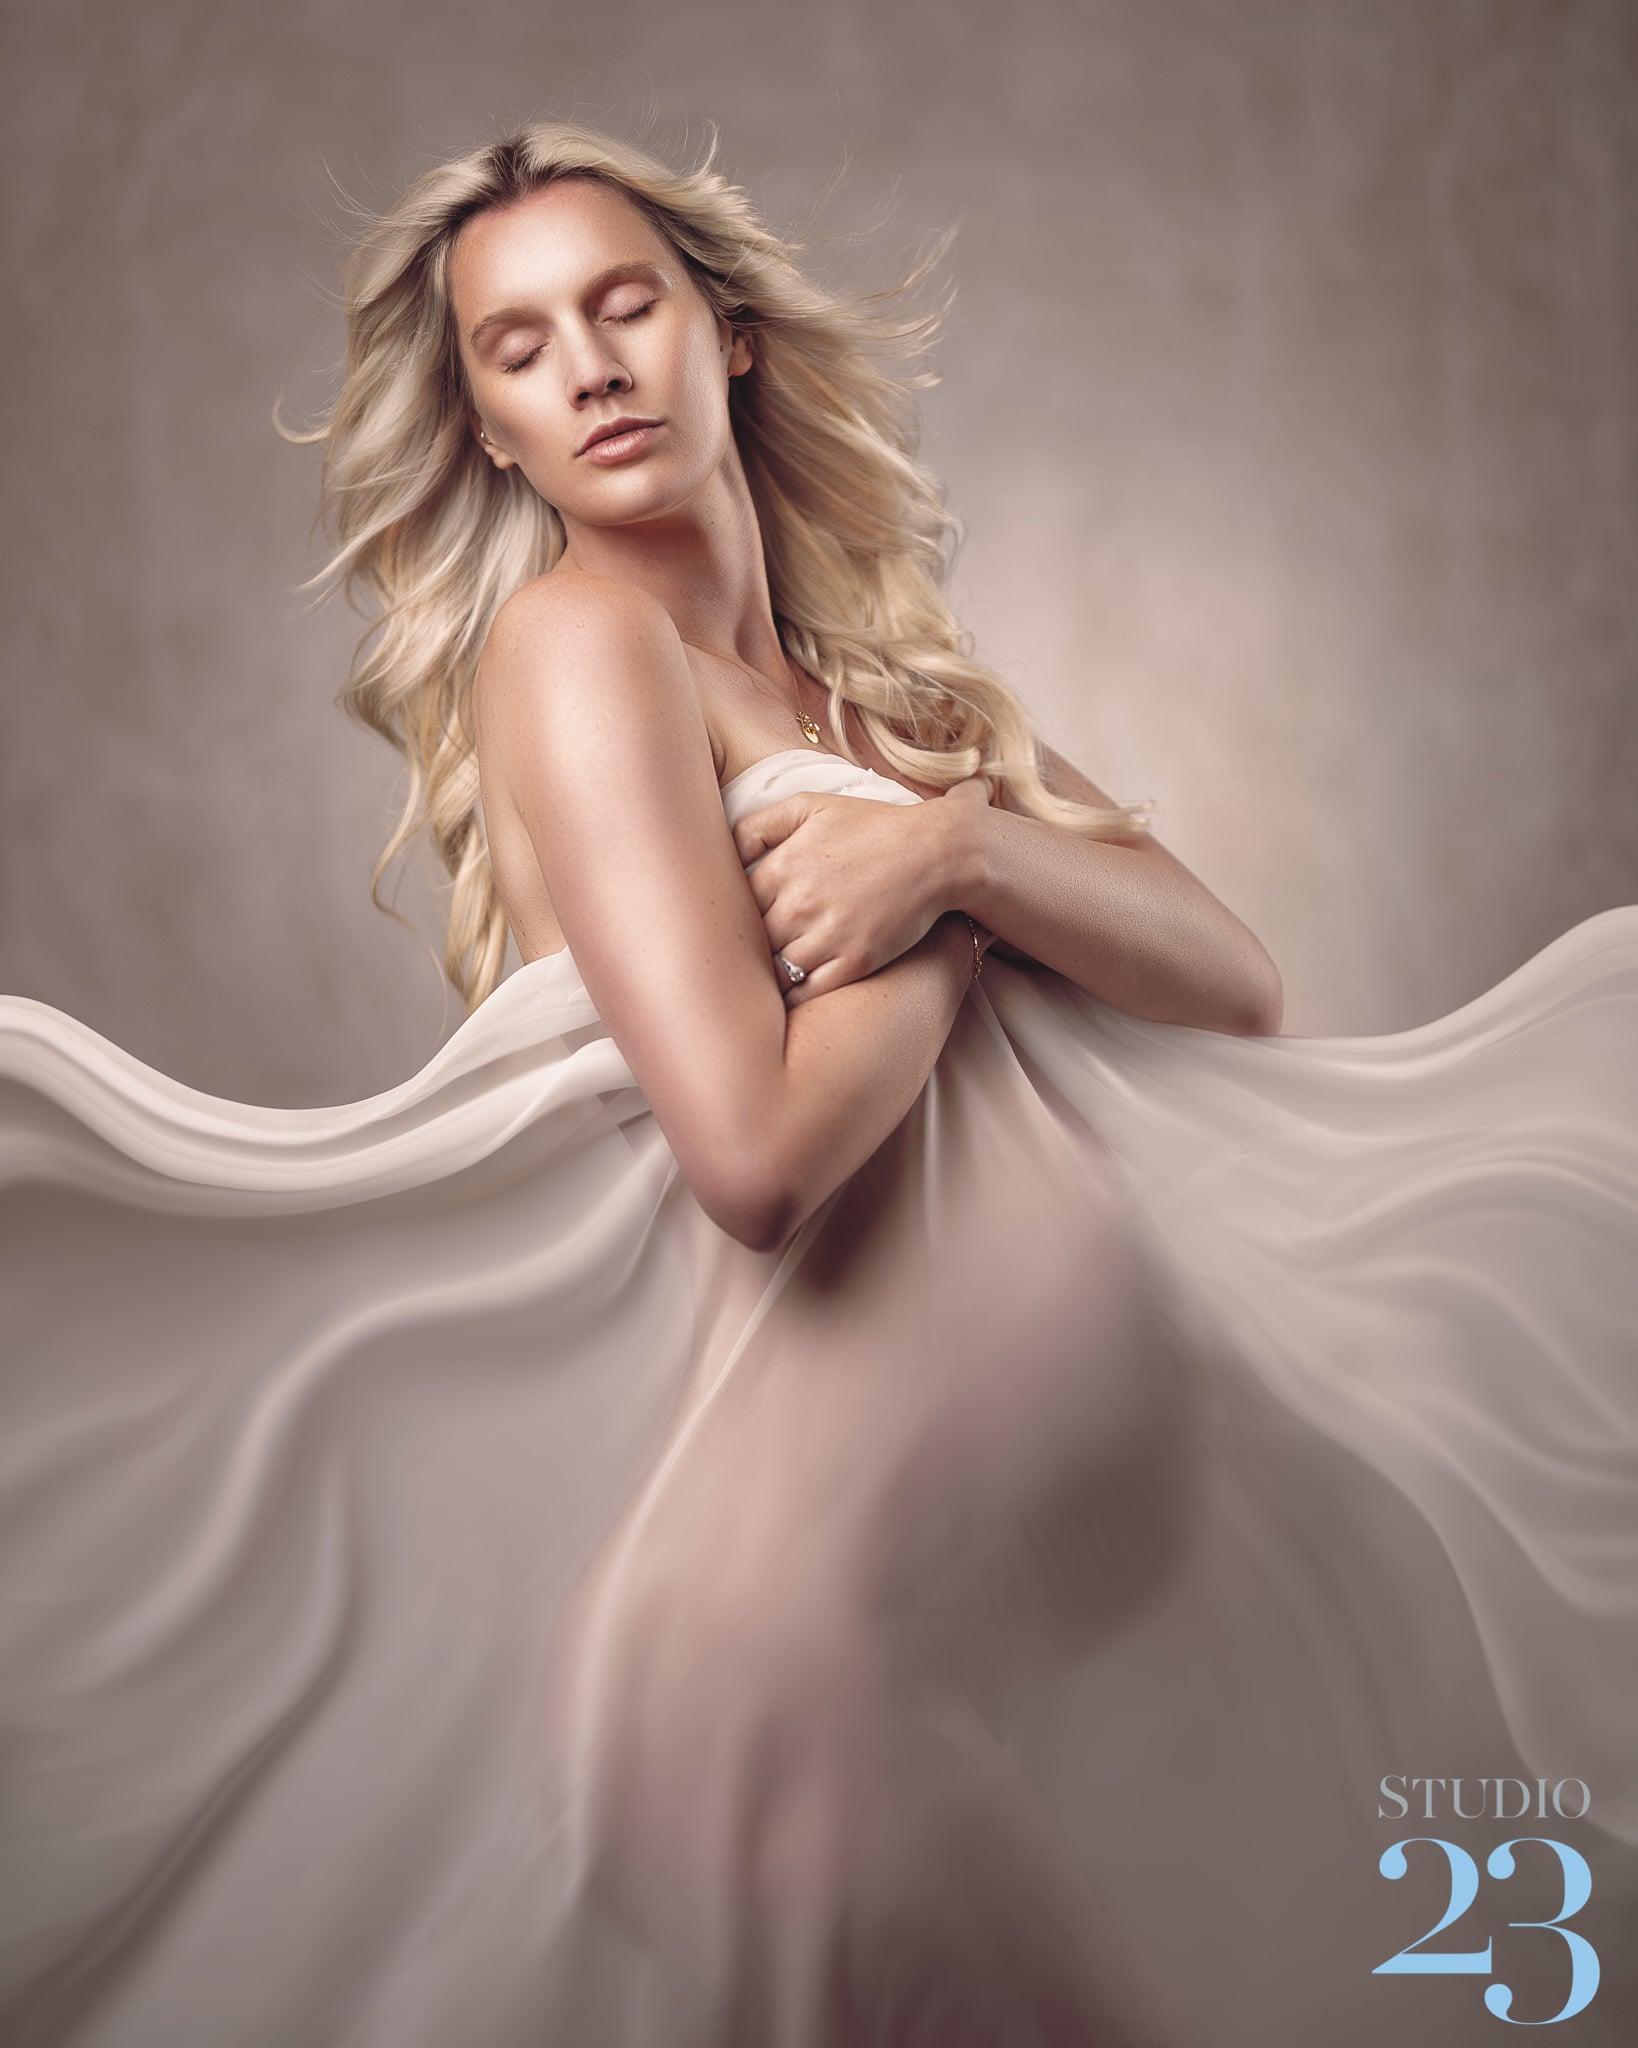 Kiera Maternity   Studio Lighting Techniques for Photographers